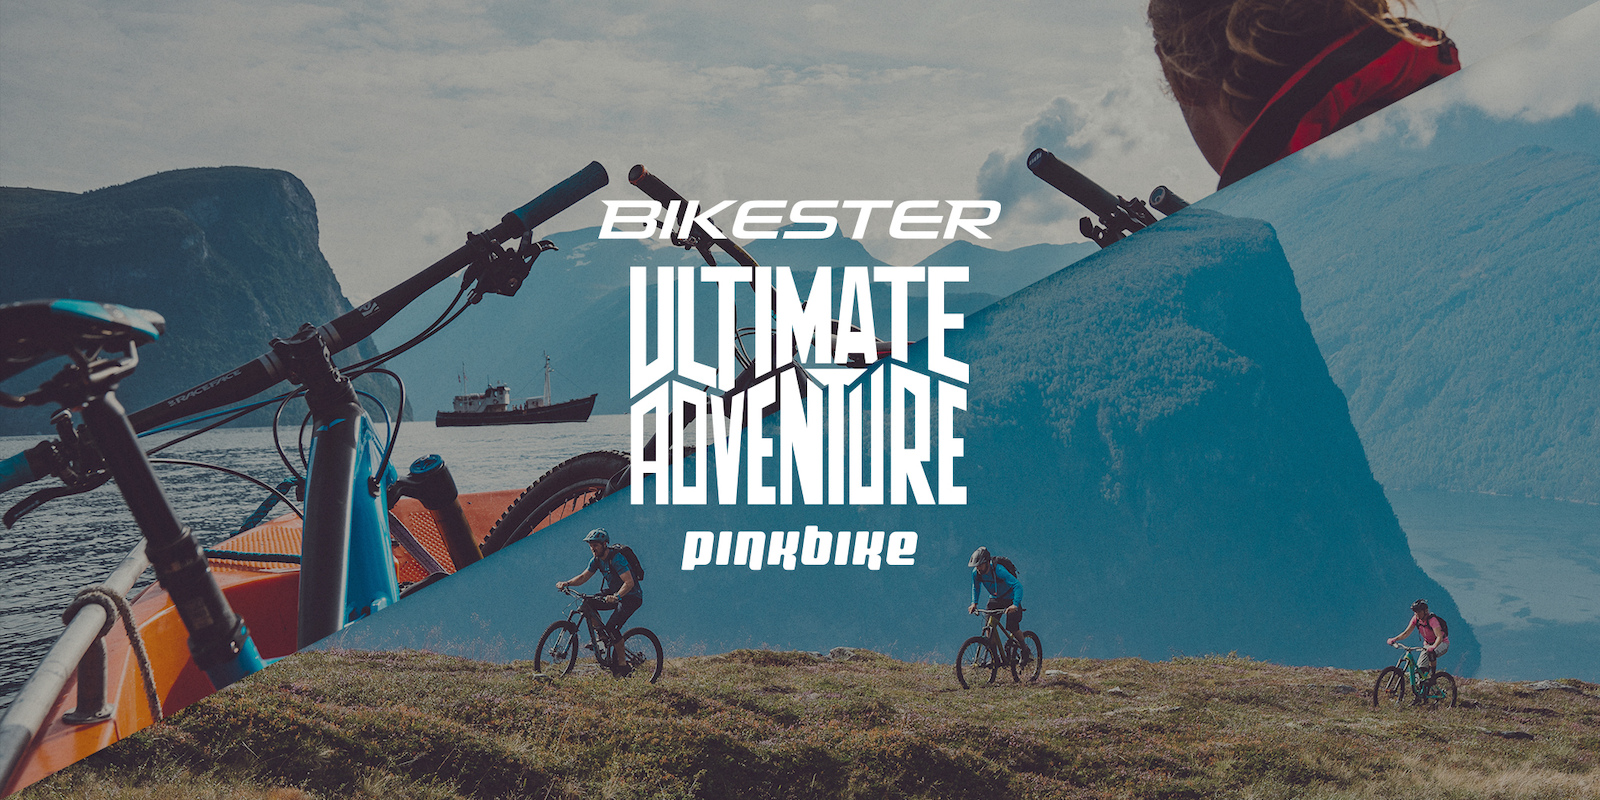 Bikester contest